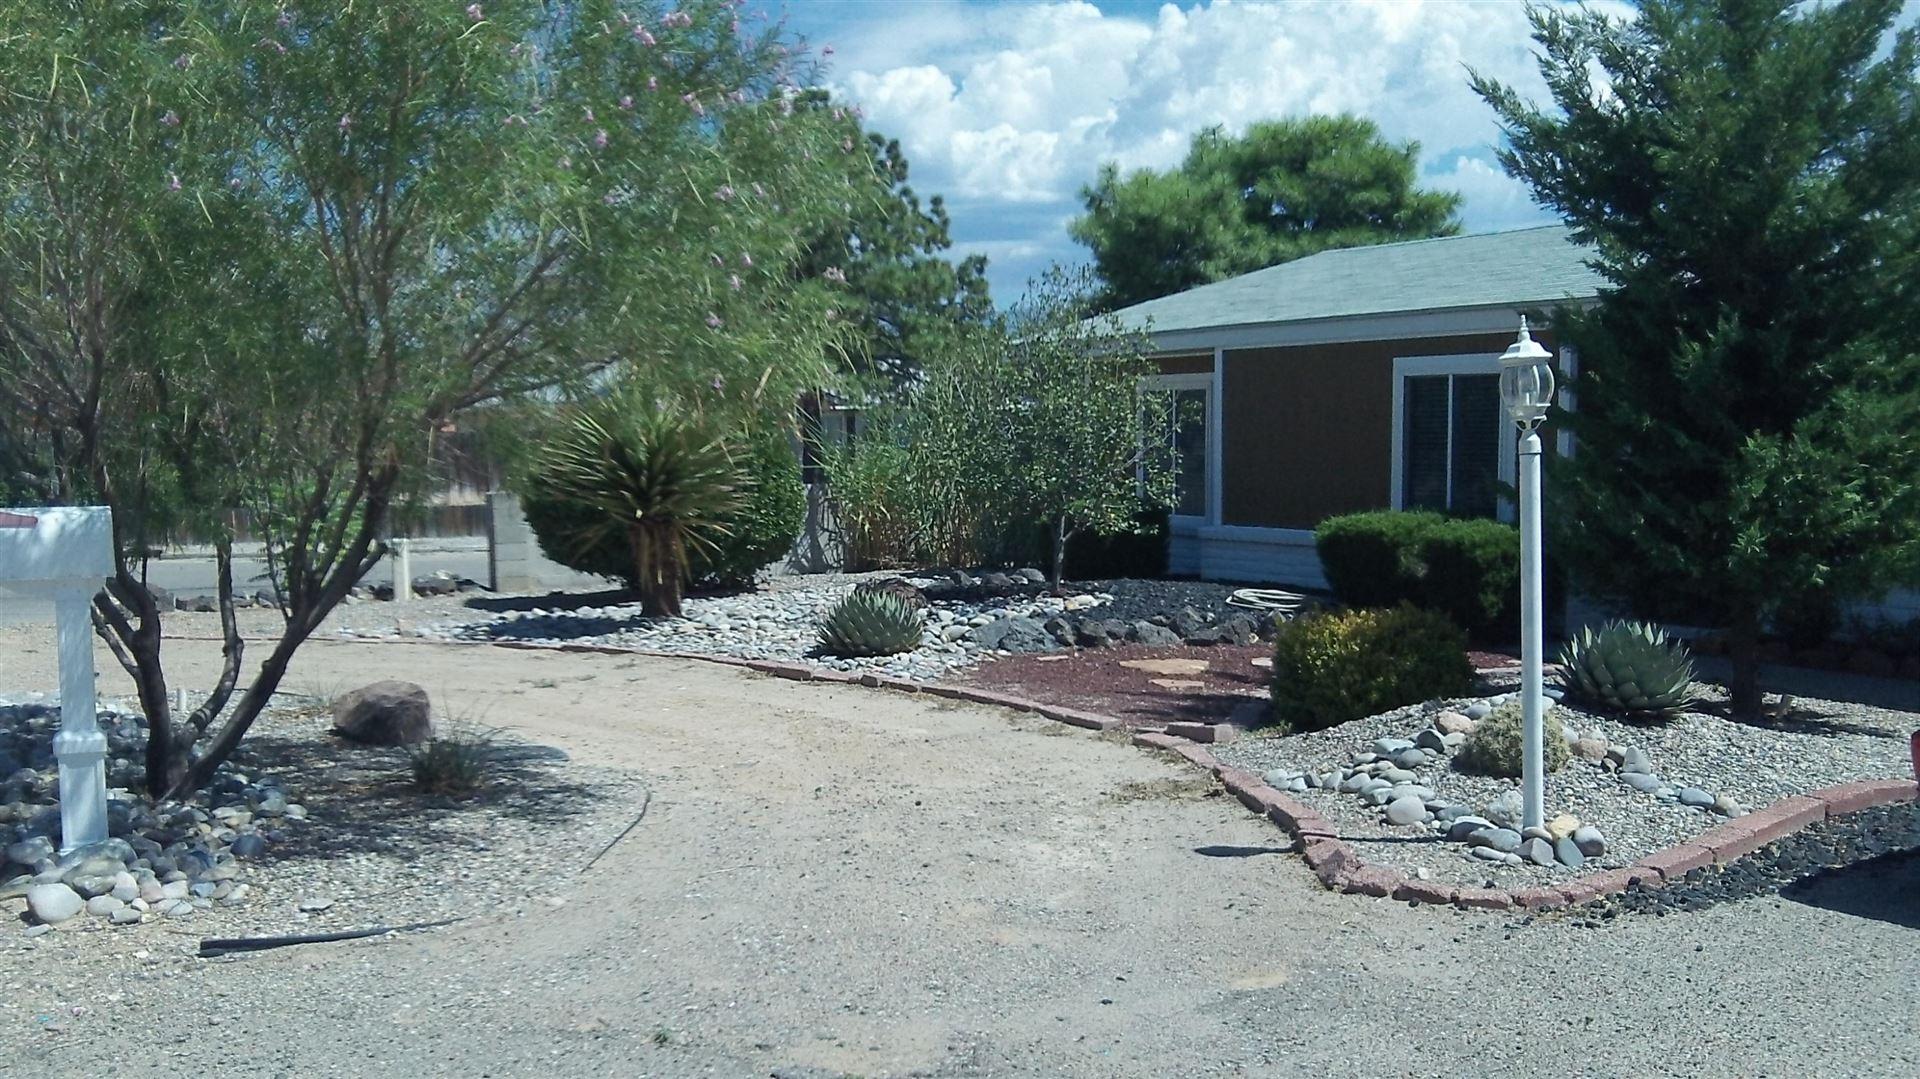 1770 FRAN Place SE, Rio Rancho, NM 87124 - MLS#: 986861